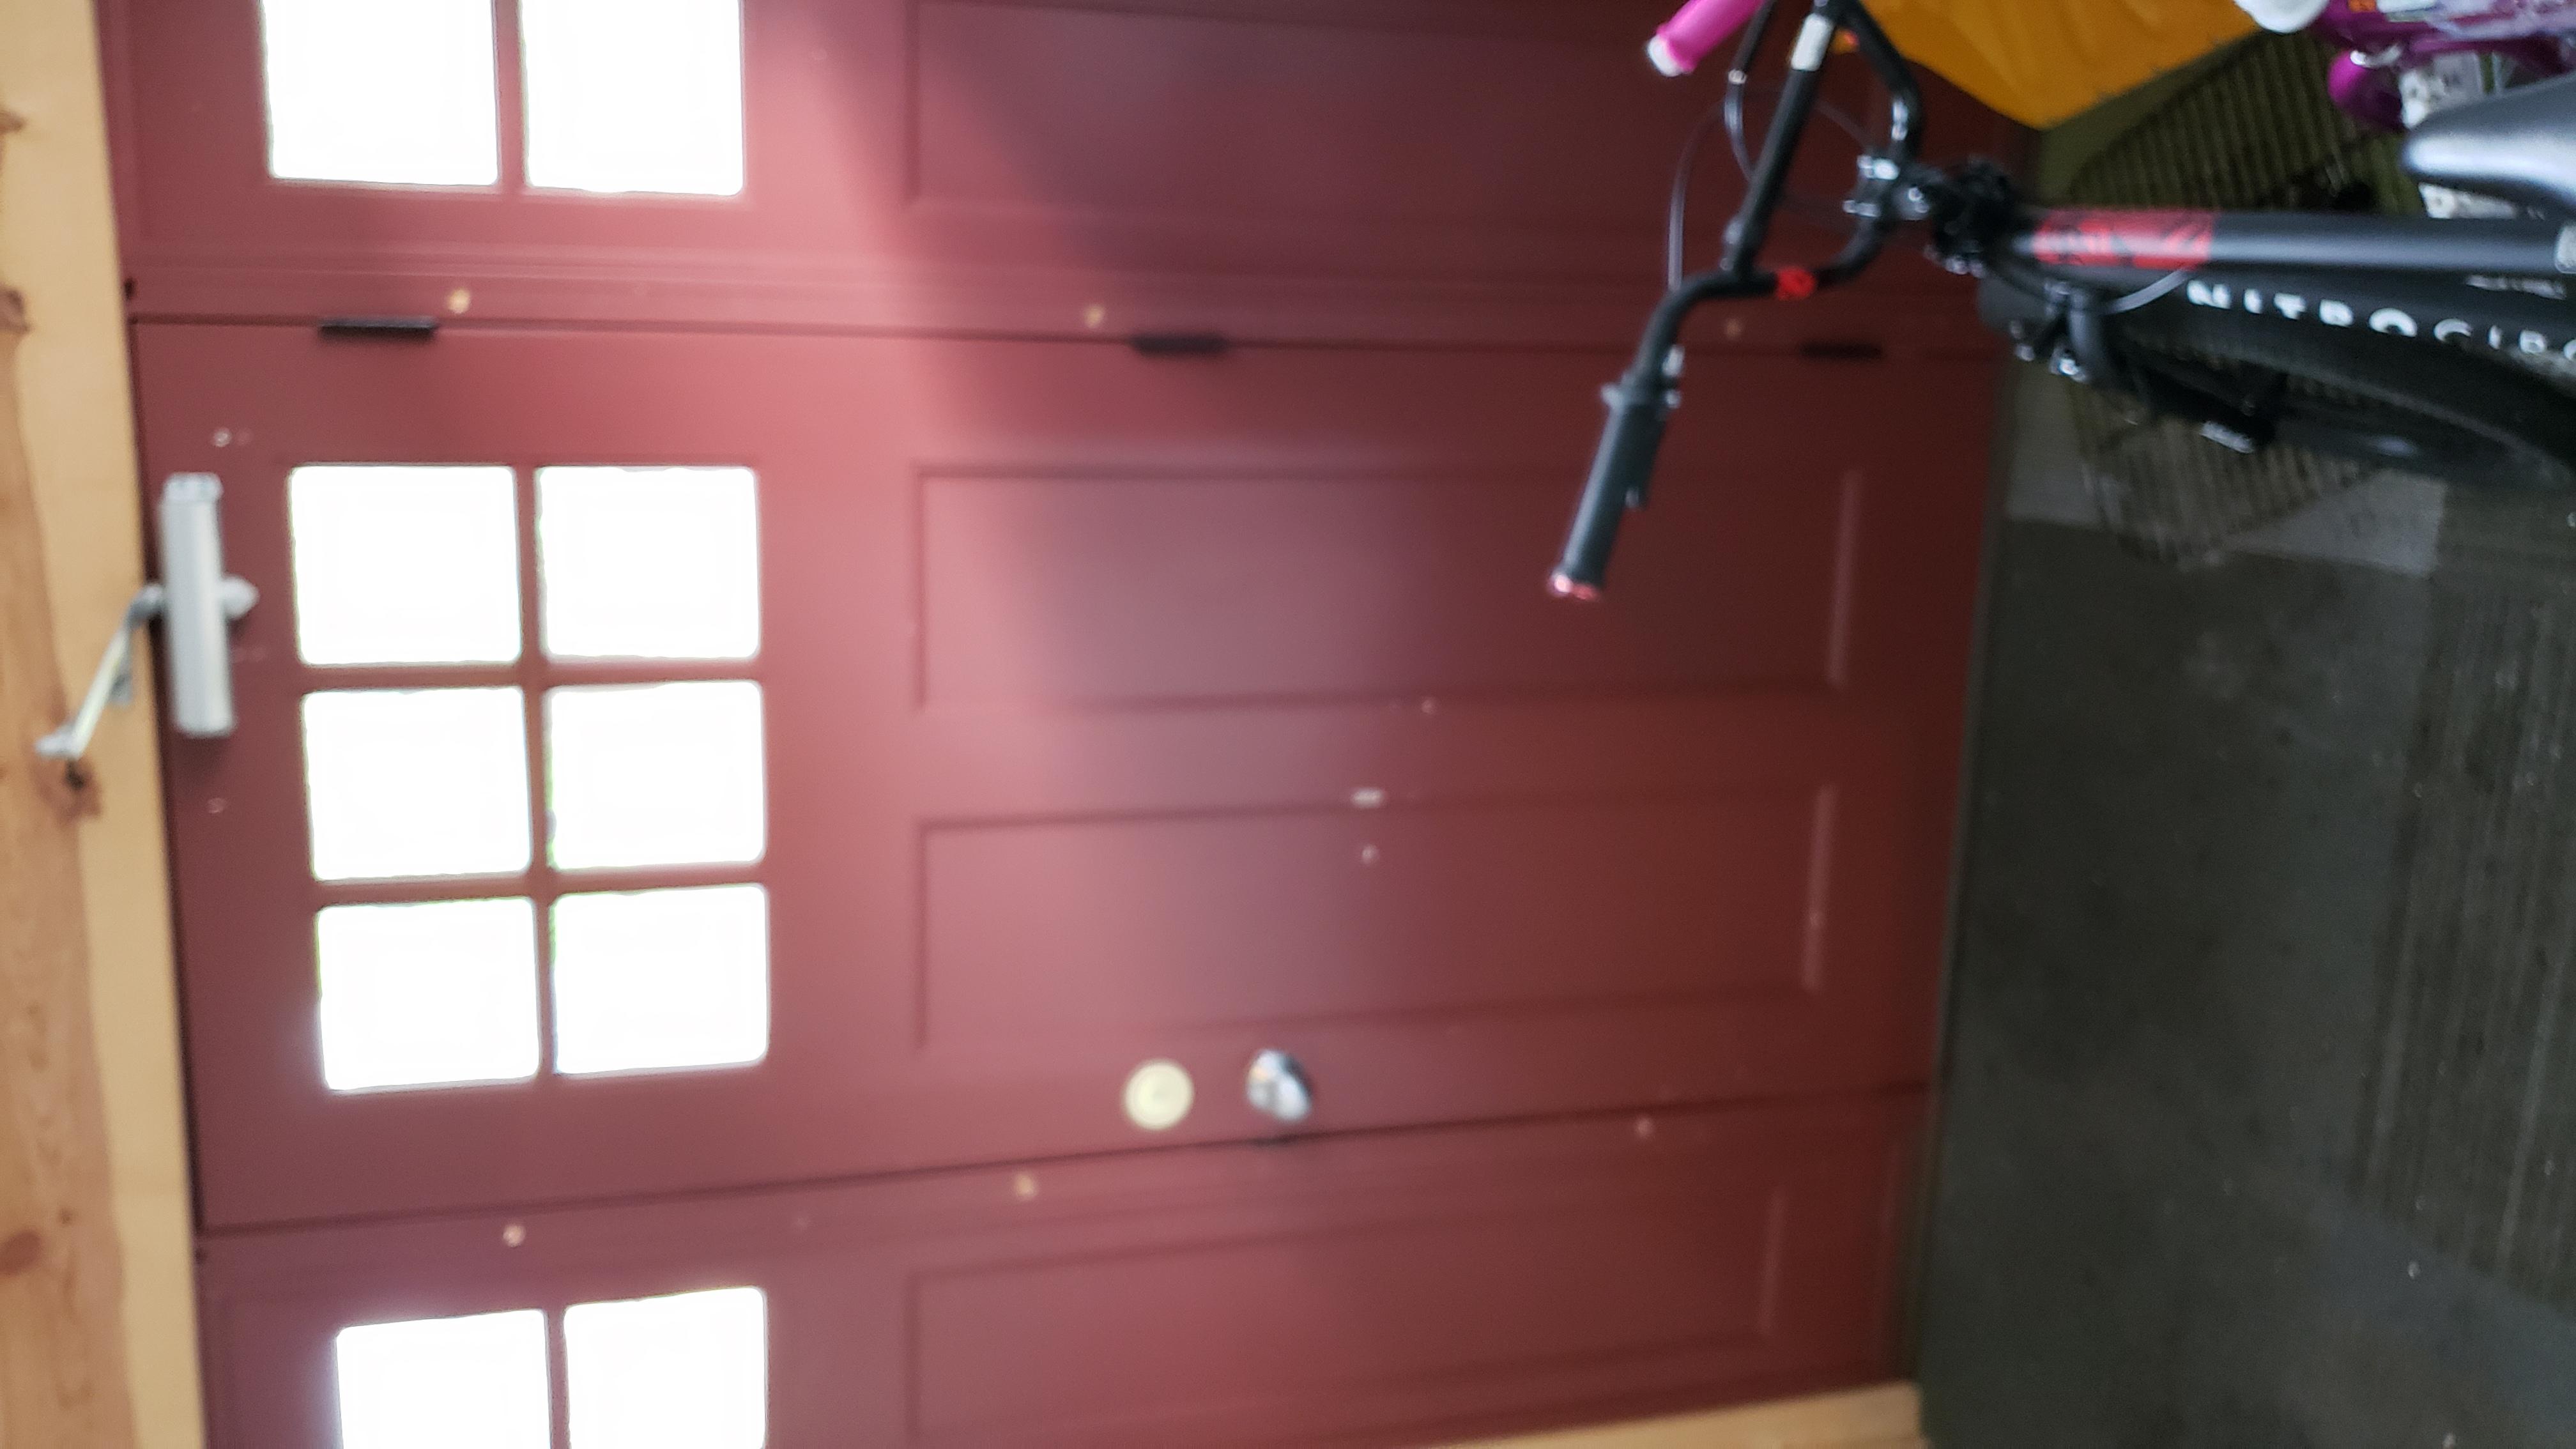 90 - duplex entry